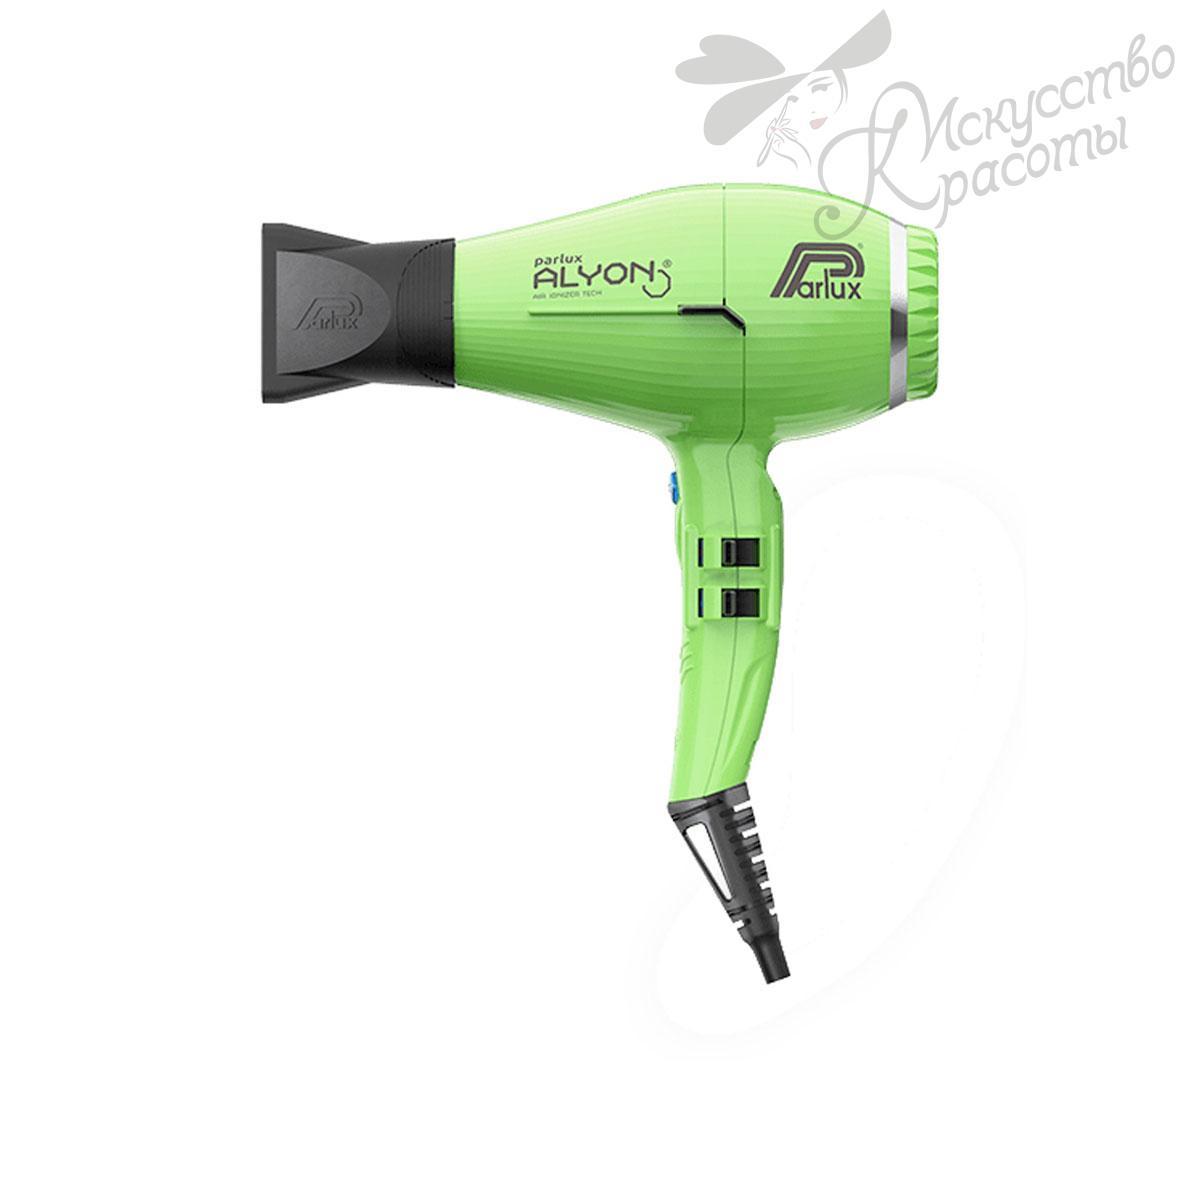 Фен для волос Parlux Alyon Green 2250 W